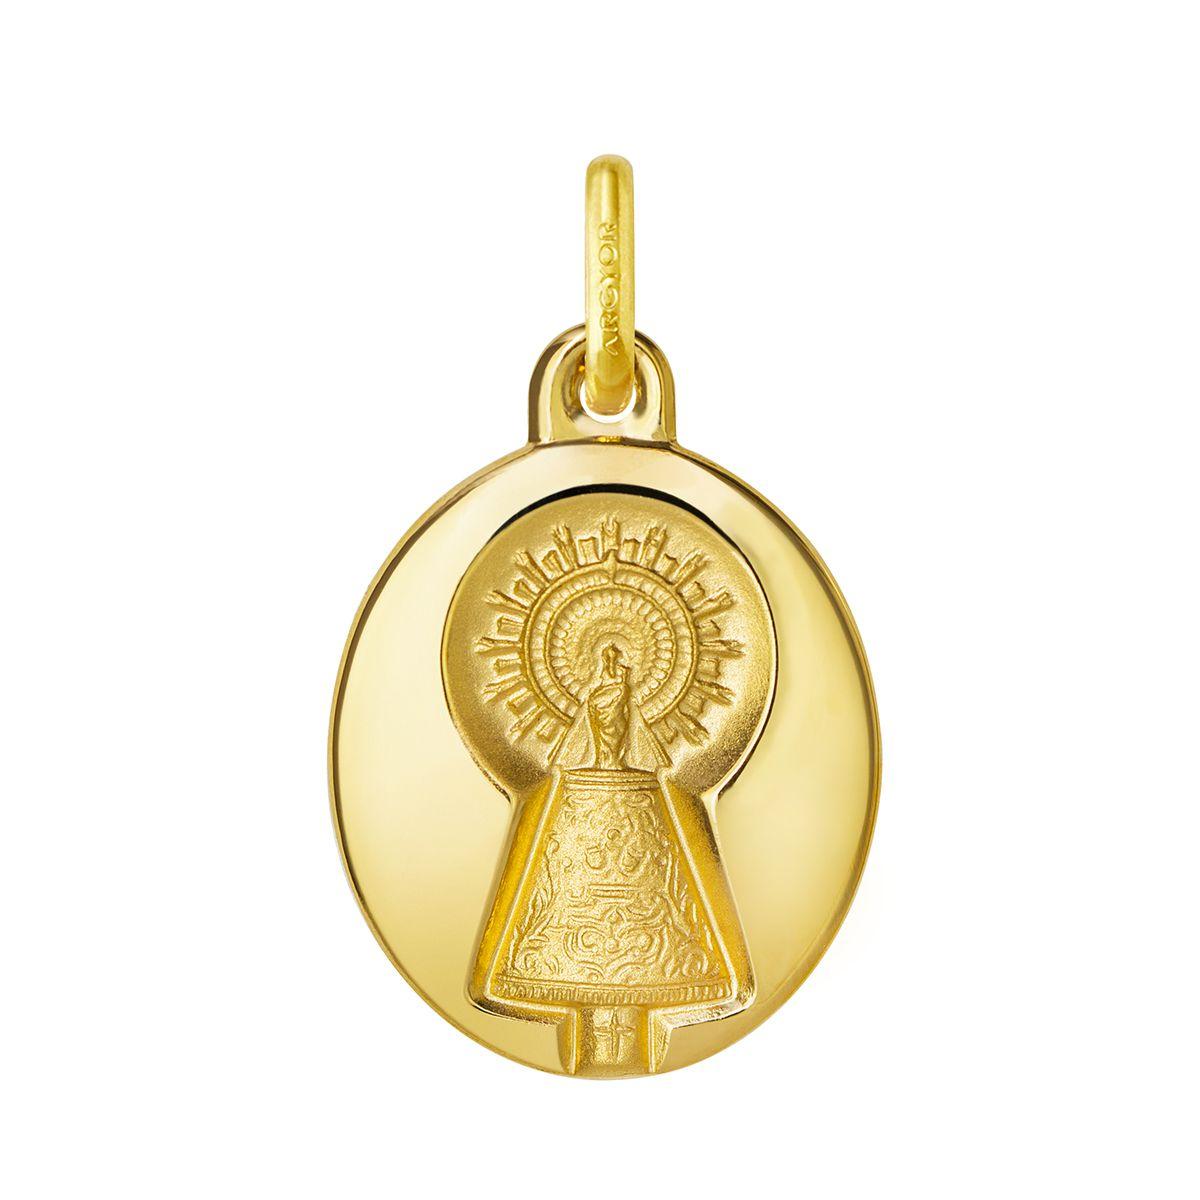 cfc8417bc88e Medalla Virgen del Pilar-18 1034215